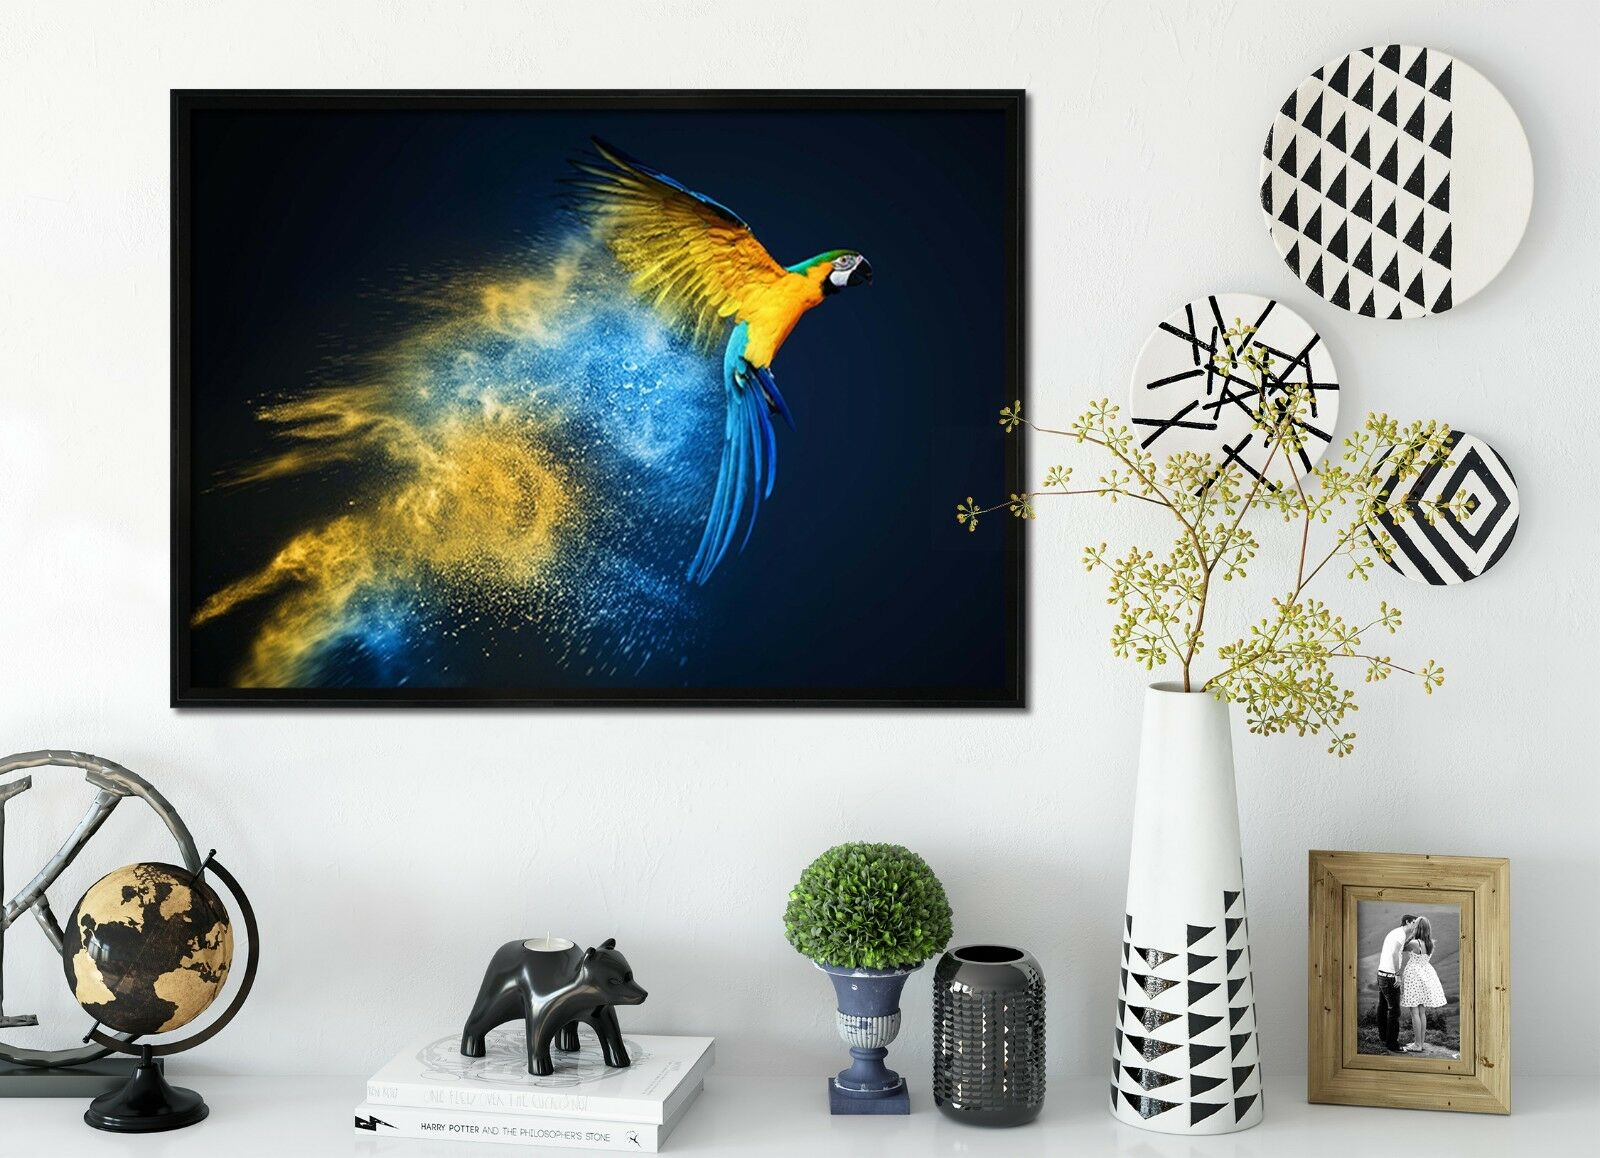 3D Papagei Fliegen 48 Gerahmt Poster Daheim Dekor Drucken Malerei Kunst AJ